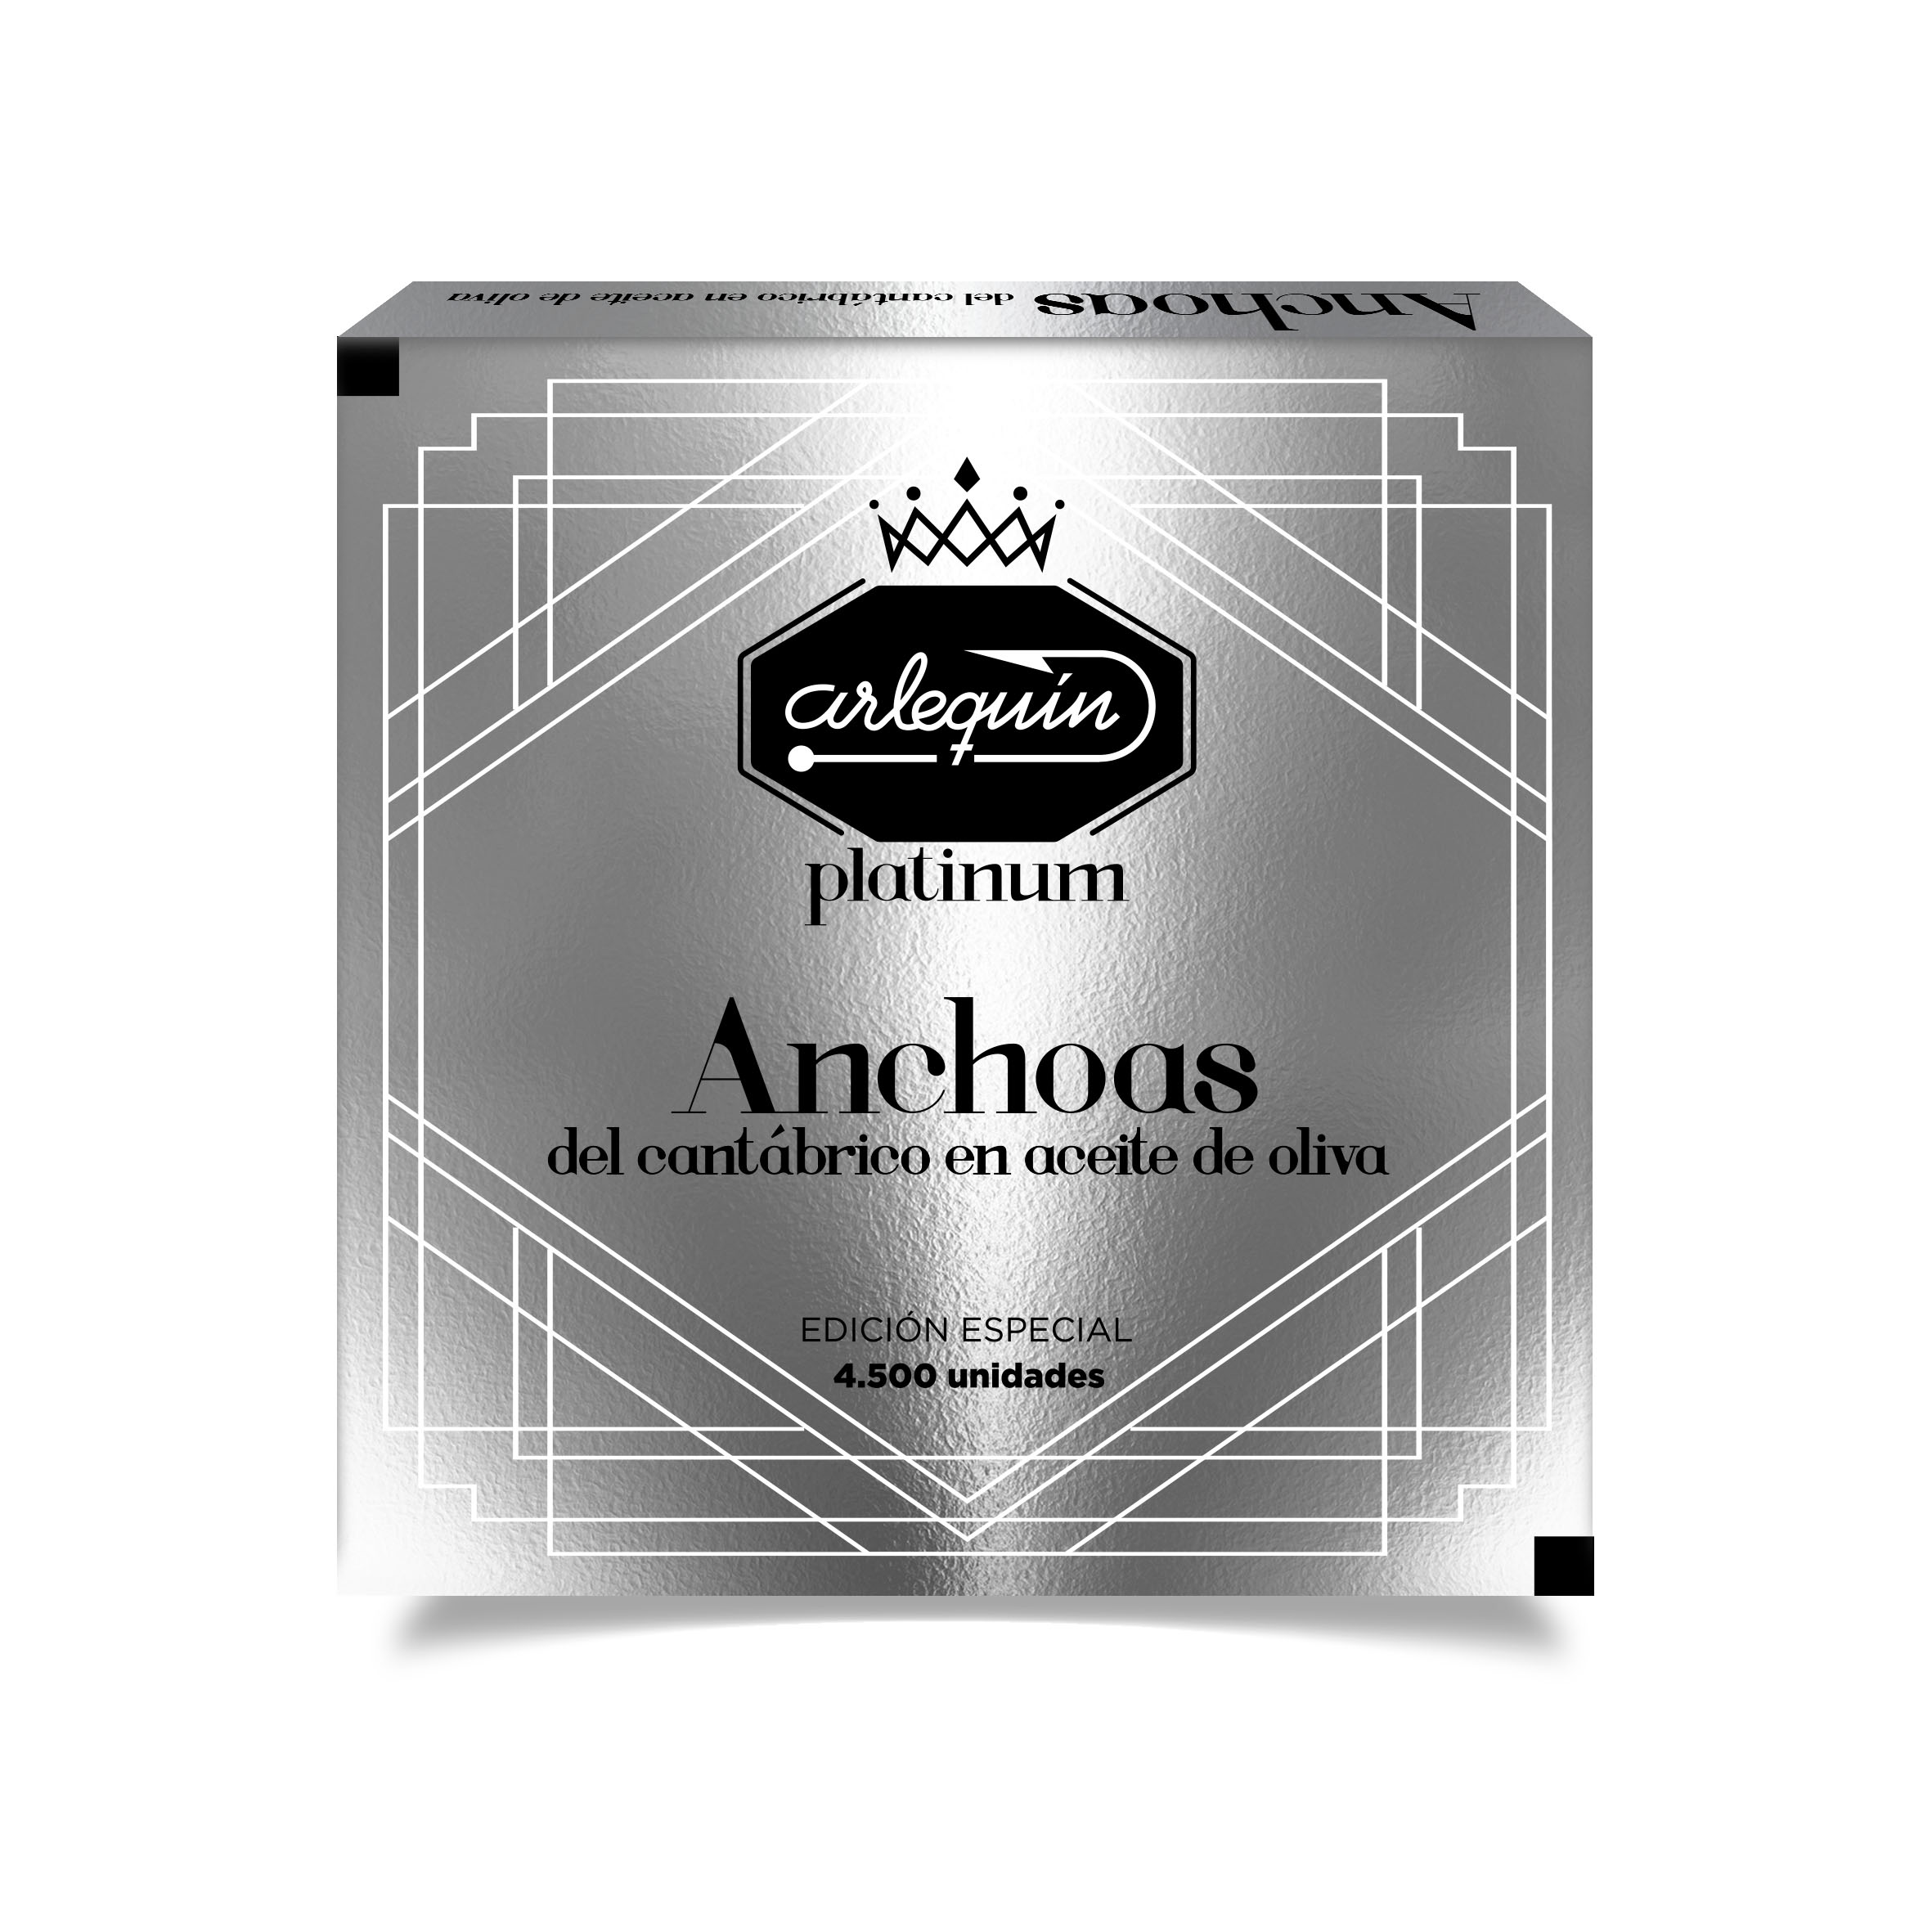 Anchoas - Arlequín Serie Platinum